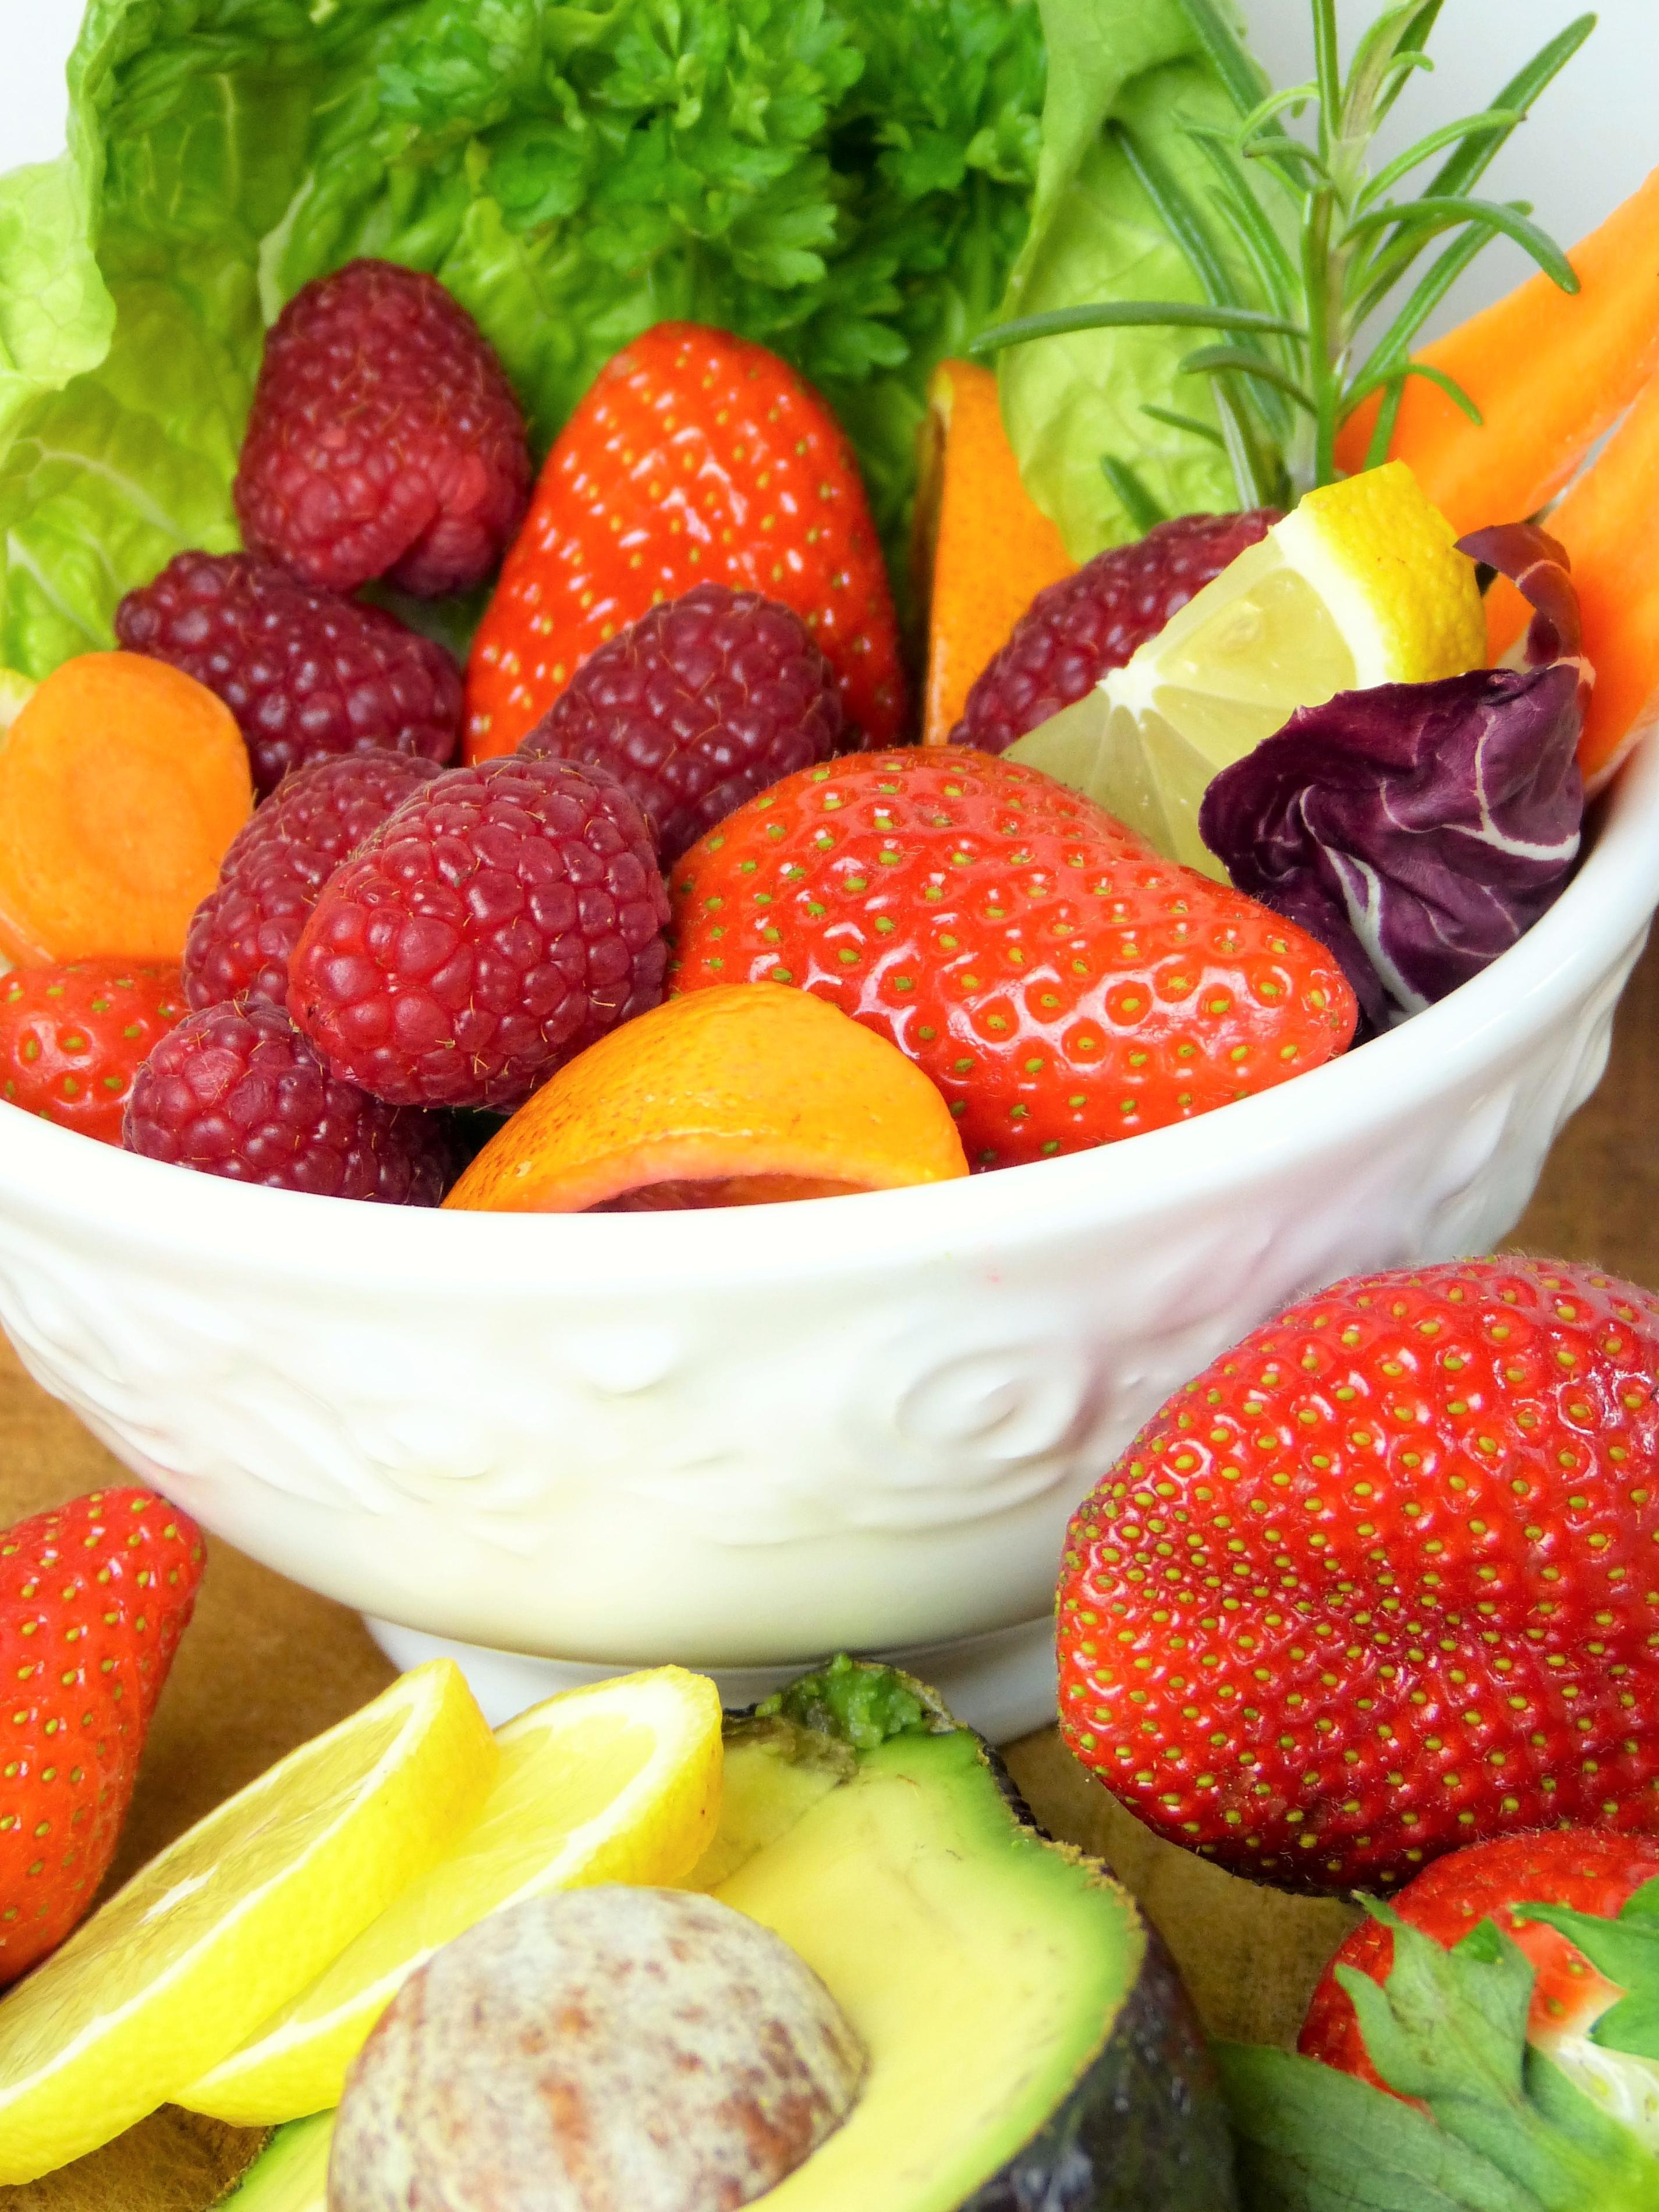 kostenlose bild obst erdbeere lebensmittel ern hrung beeren s dessert vitamin. Black Bedroom Furniture Sets. Home Design Ideas